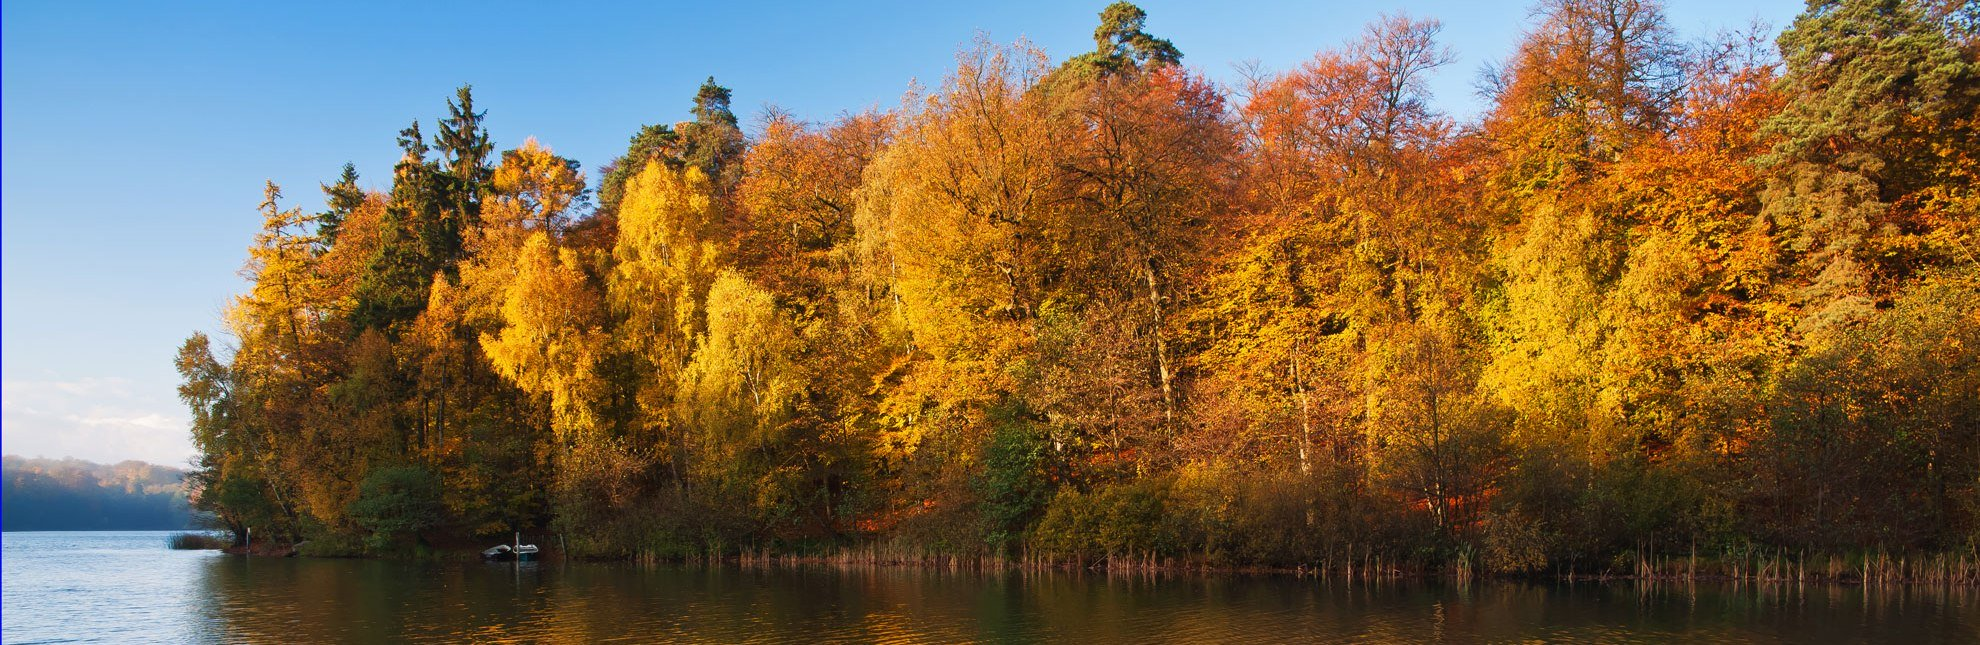 Herbstsee, © Thomas Ebelt / HLMS GmbH